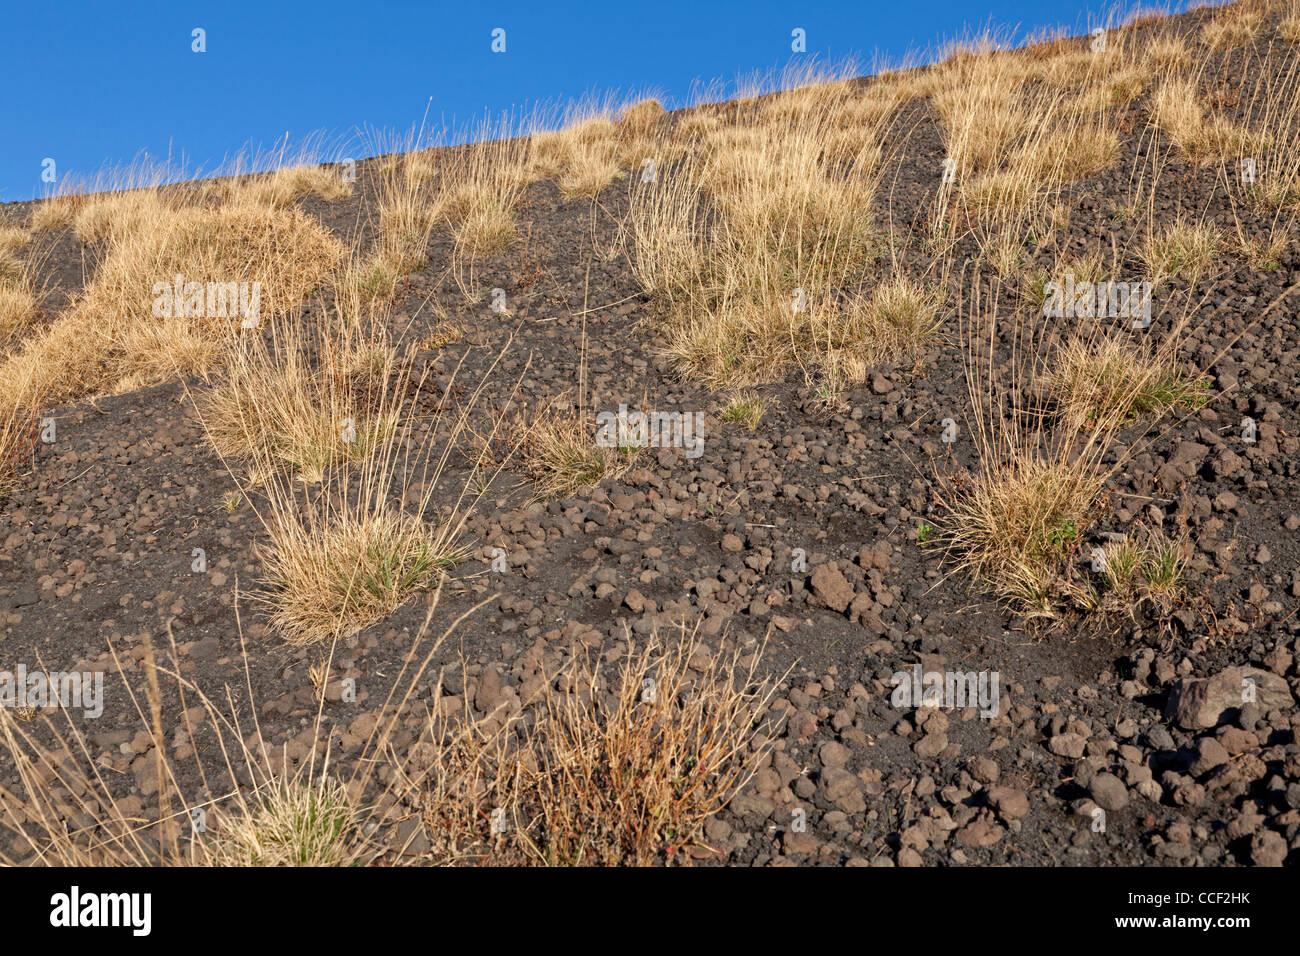 Lava field at Etna, Sicily, Italy - Stock Image